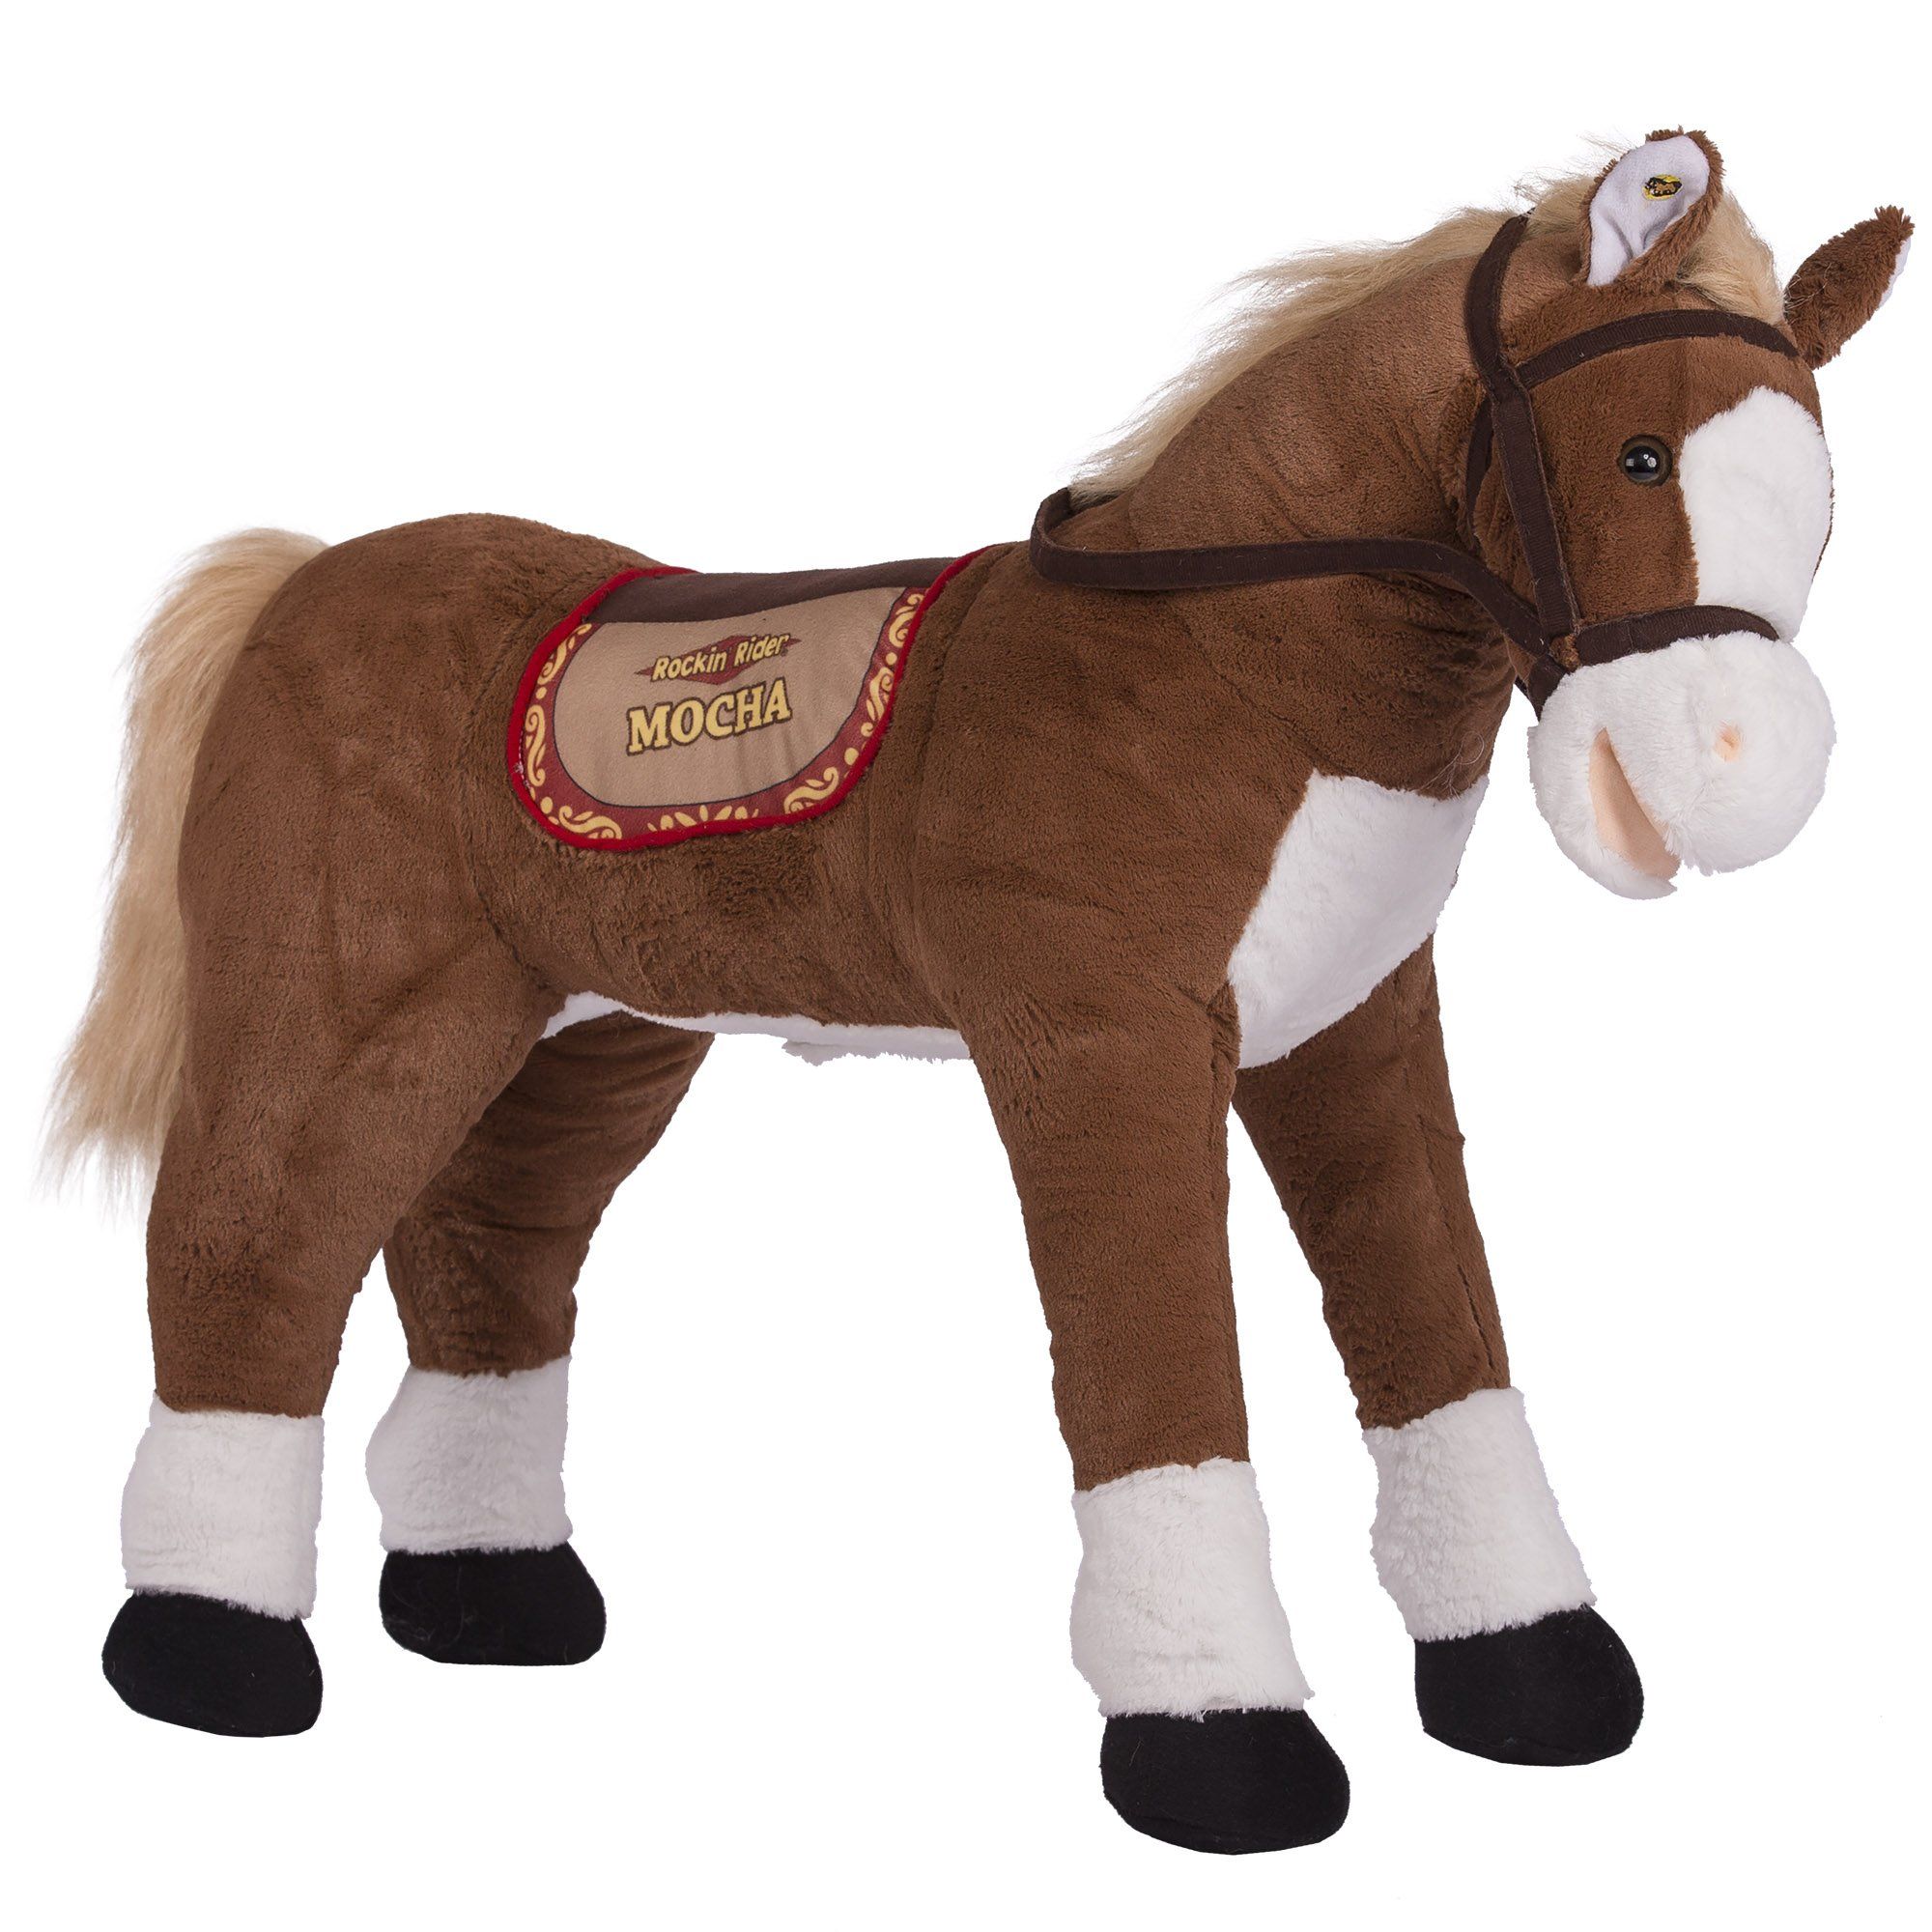 Rockin' Rider Mocha Stable Horse Plush, Brown